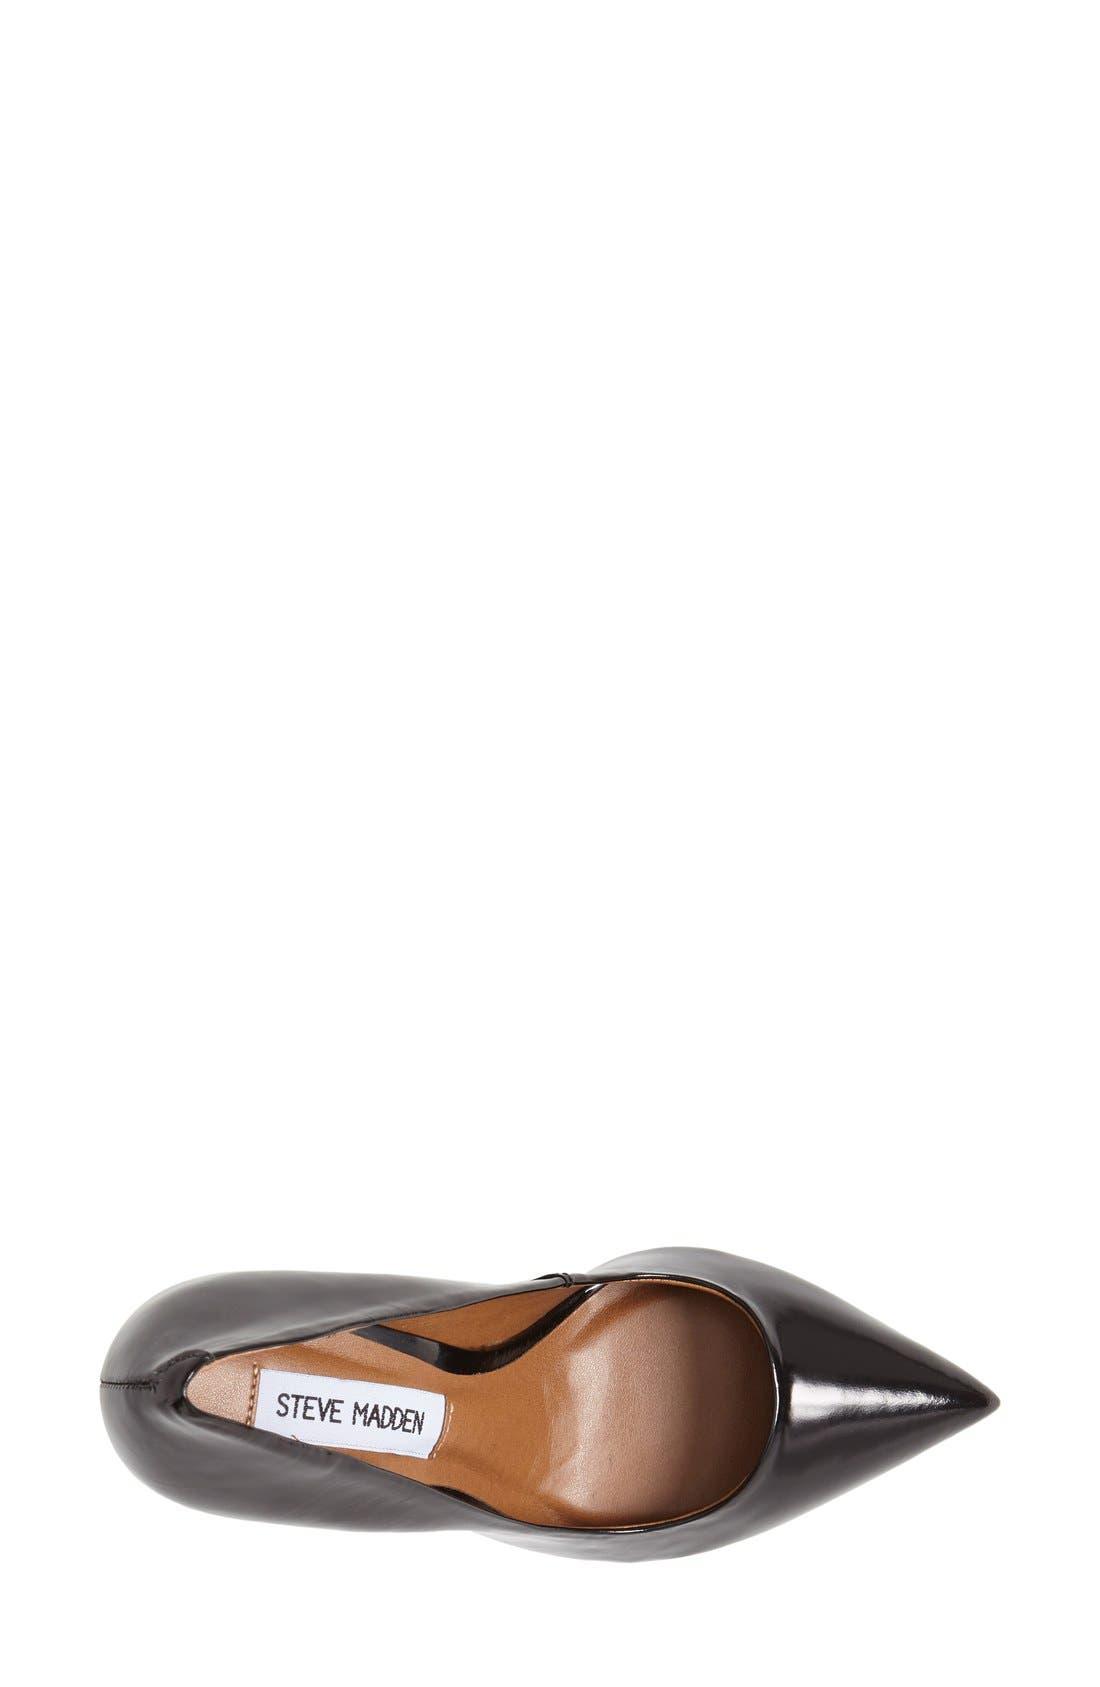 STEVE MADDEN, 'Proto' Pointy Toe Pump, Alternate thumbnail 3, color, 001